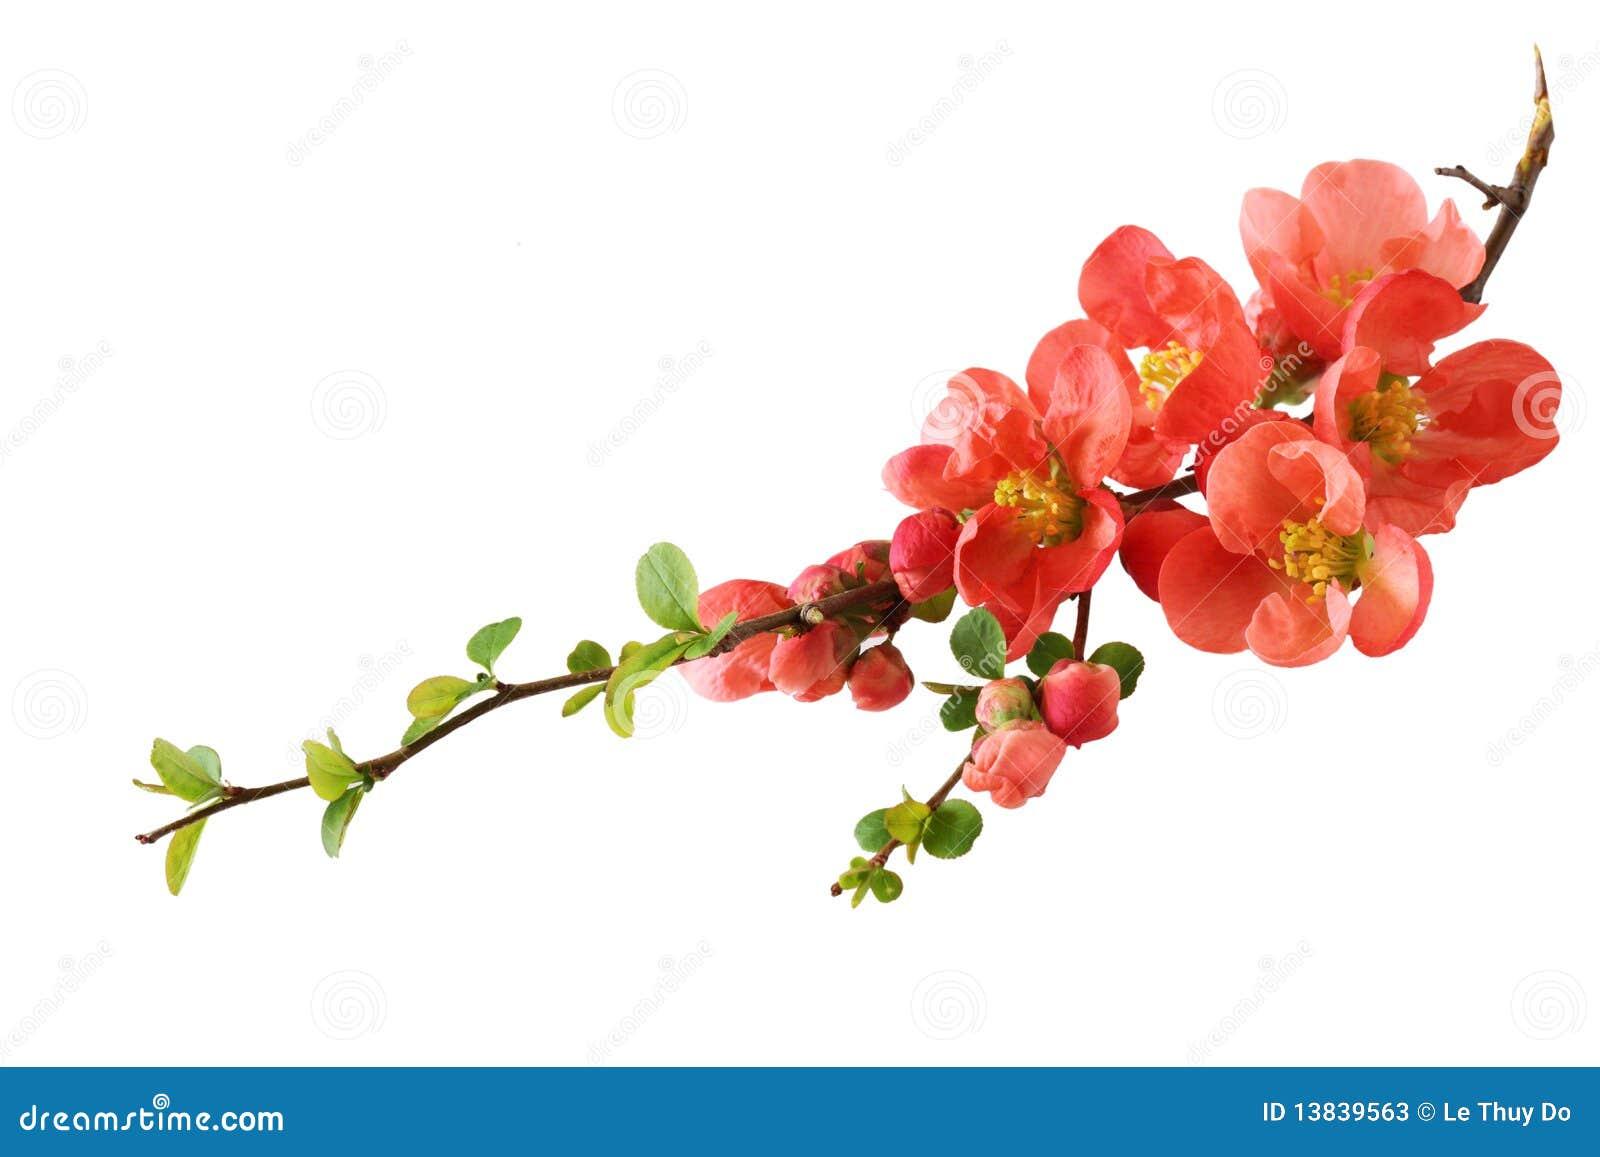 orange cherry blossom stock image image of seasonal 13839563